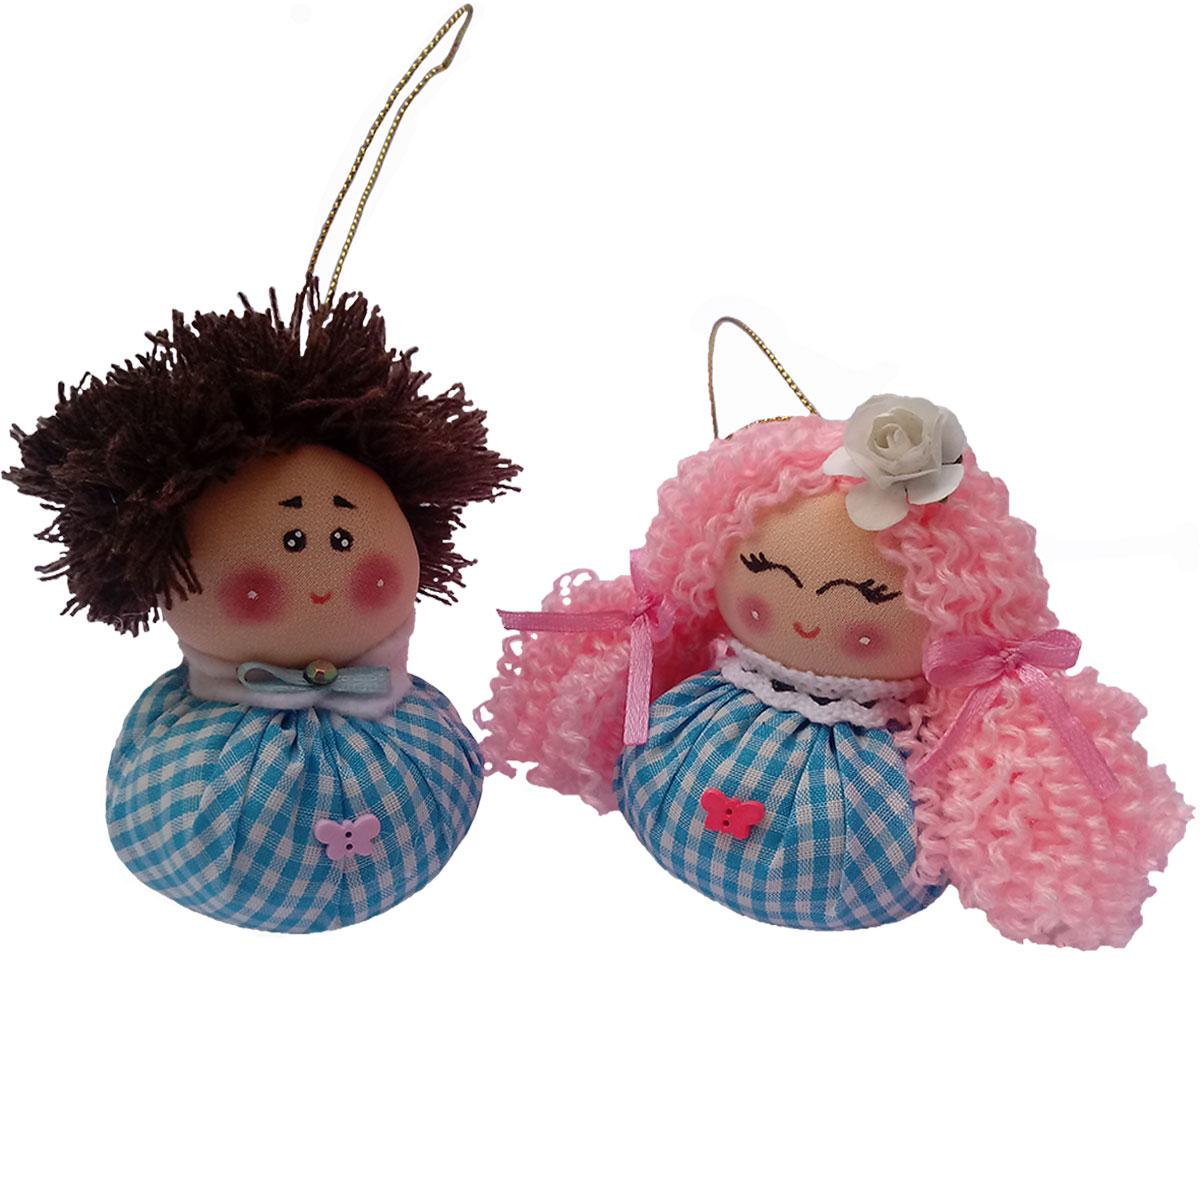 آویز عروسکی طرح دختر و پسر فندقی مجموعه 2 عددی